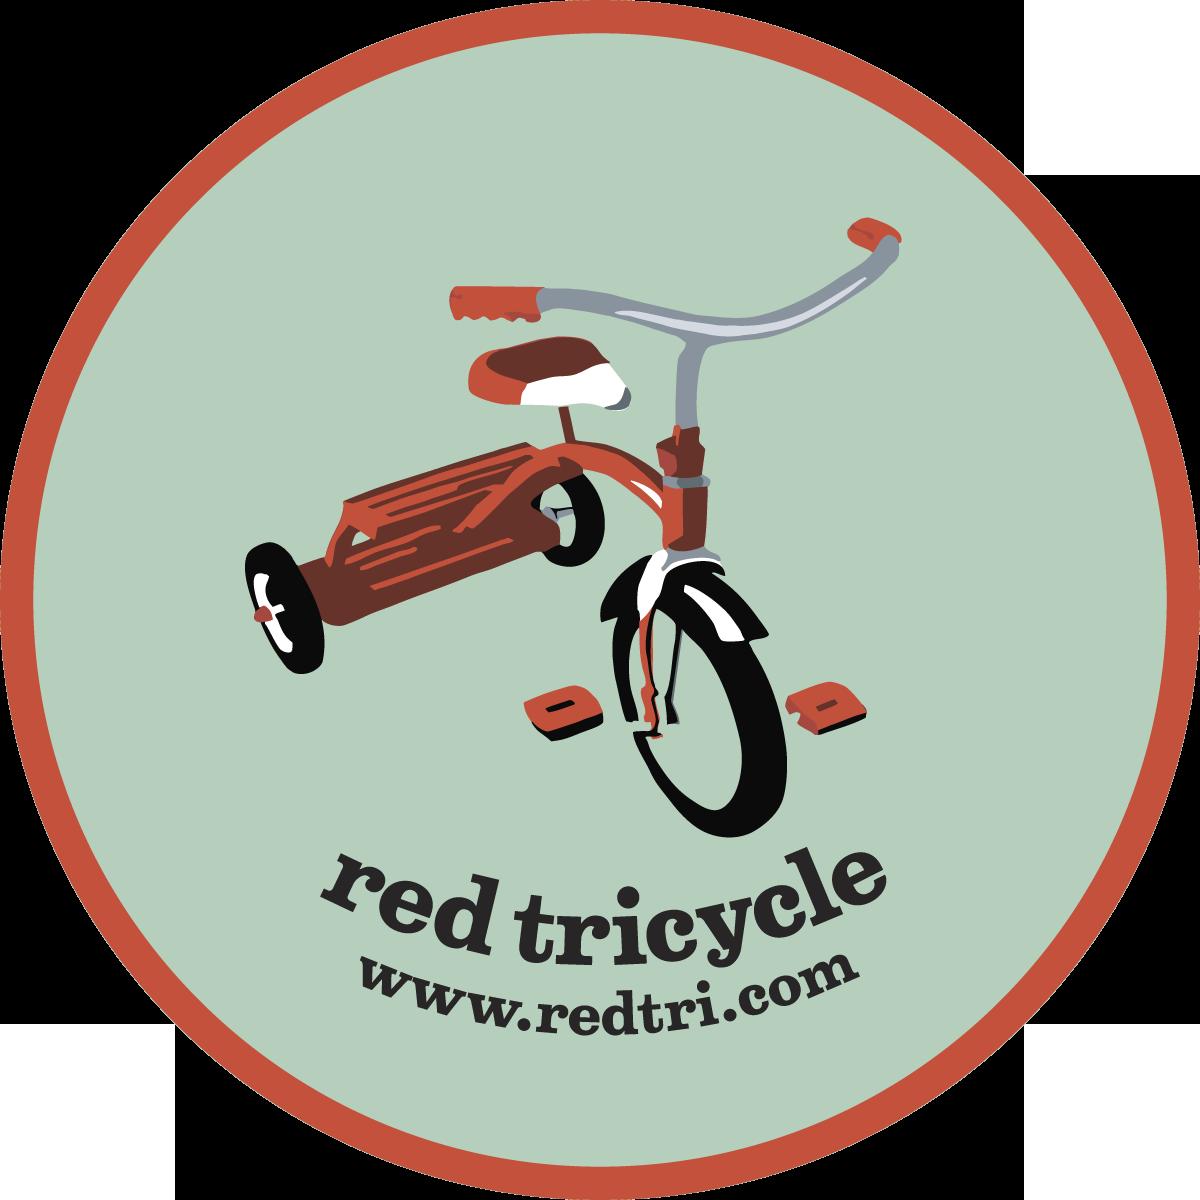 RedTricycle Atlanta